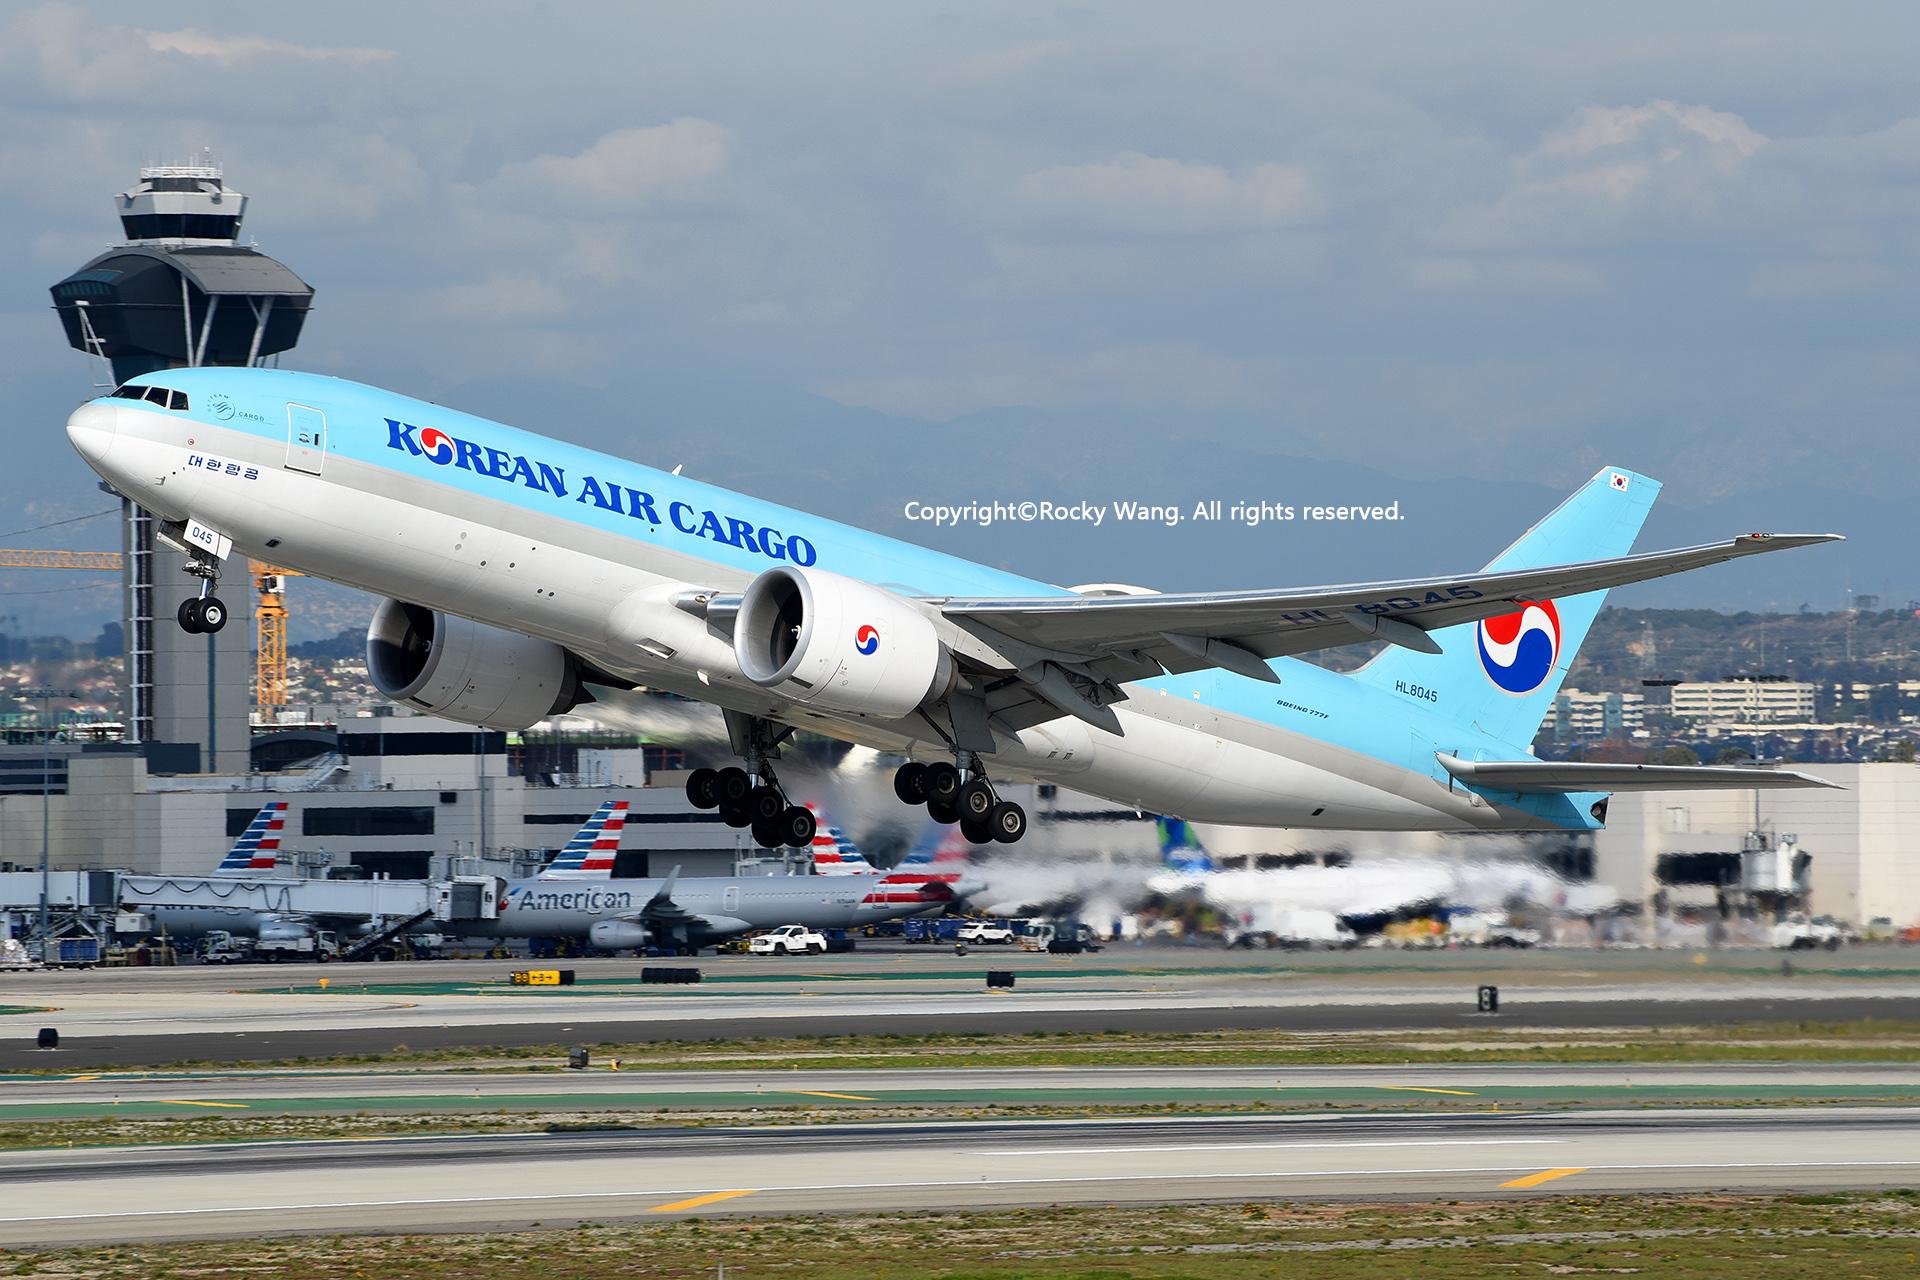 Re:[原创]居家了 批量处理老图 倾情奉献52家777 BOEING 777-FB5 HL8045 Los Angeles Int'l Airport